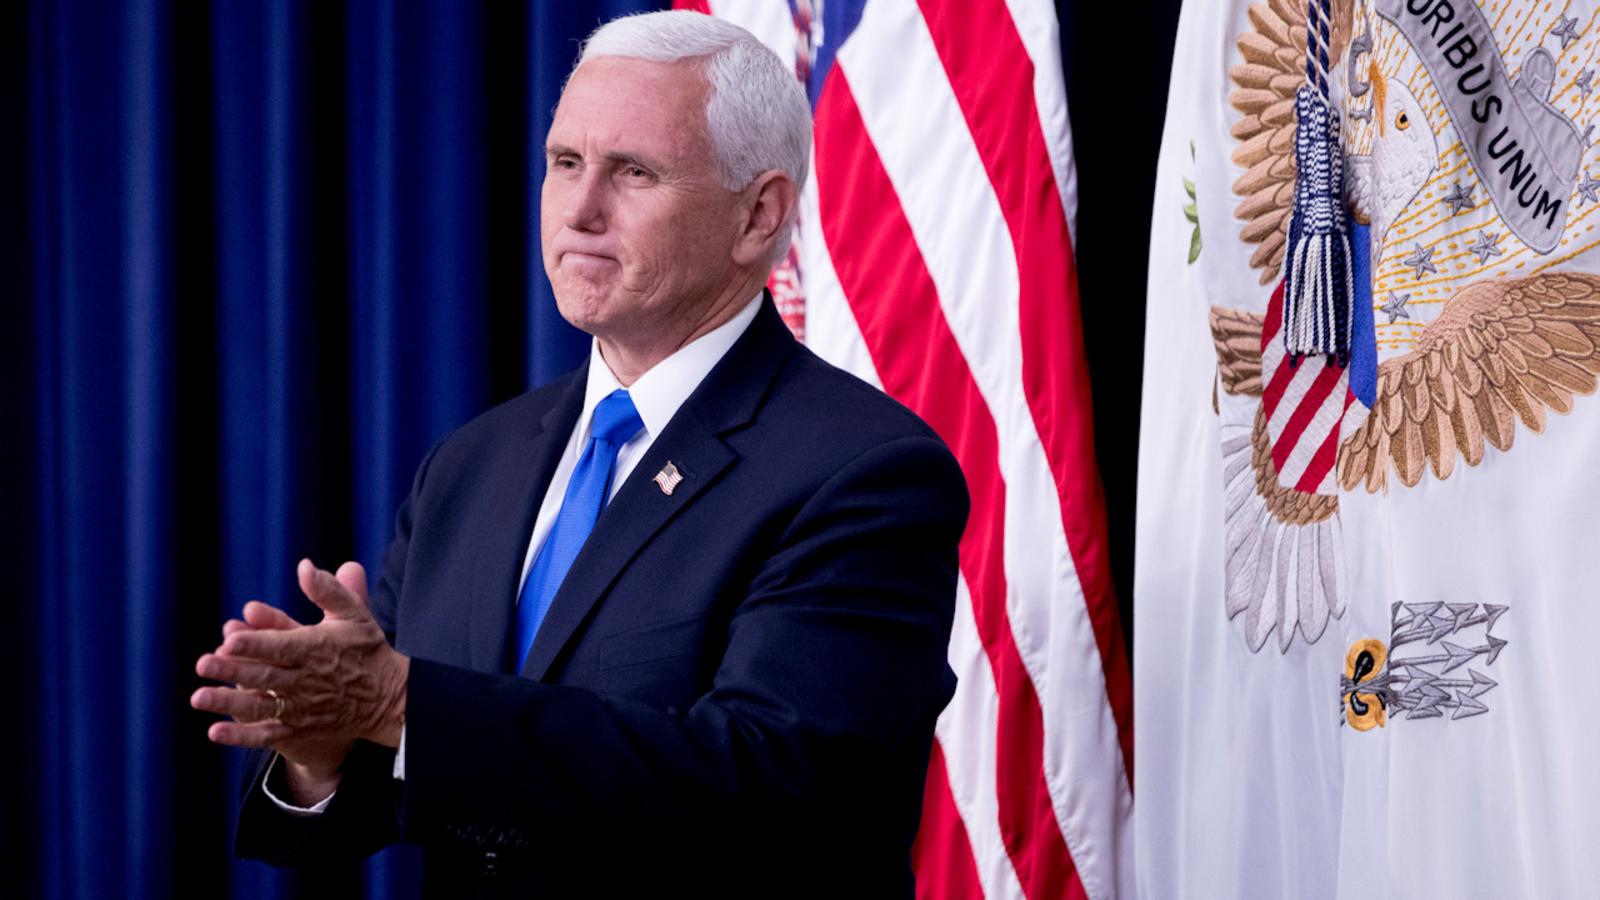 VP Mike Pence to visit Malvern company, Philadelphia FOP this week